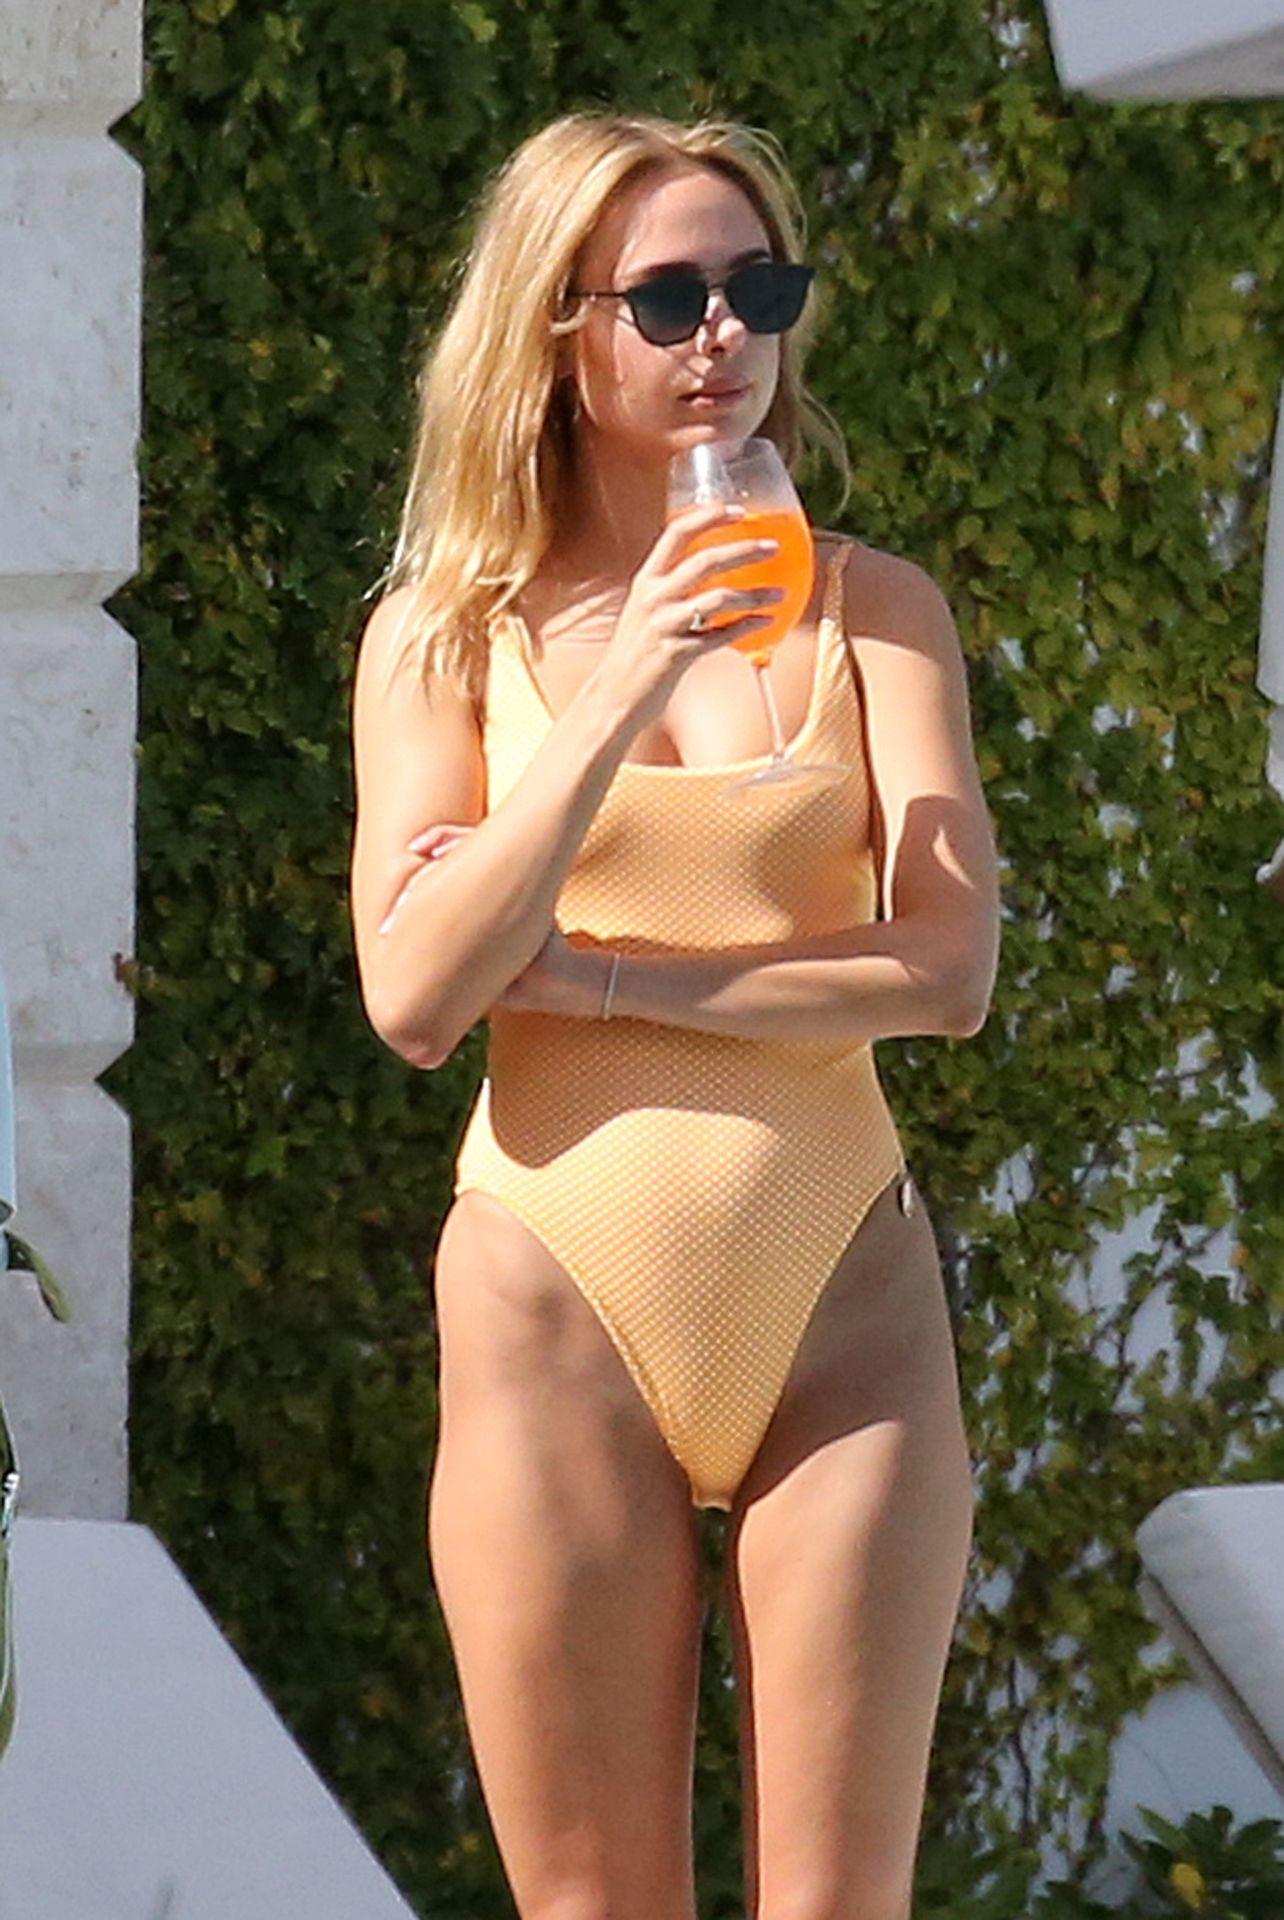 Kimberley Garner Seen Wearing An Orange Swimsuit In Miami 0008